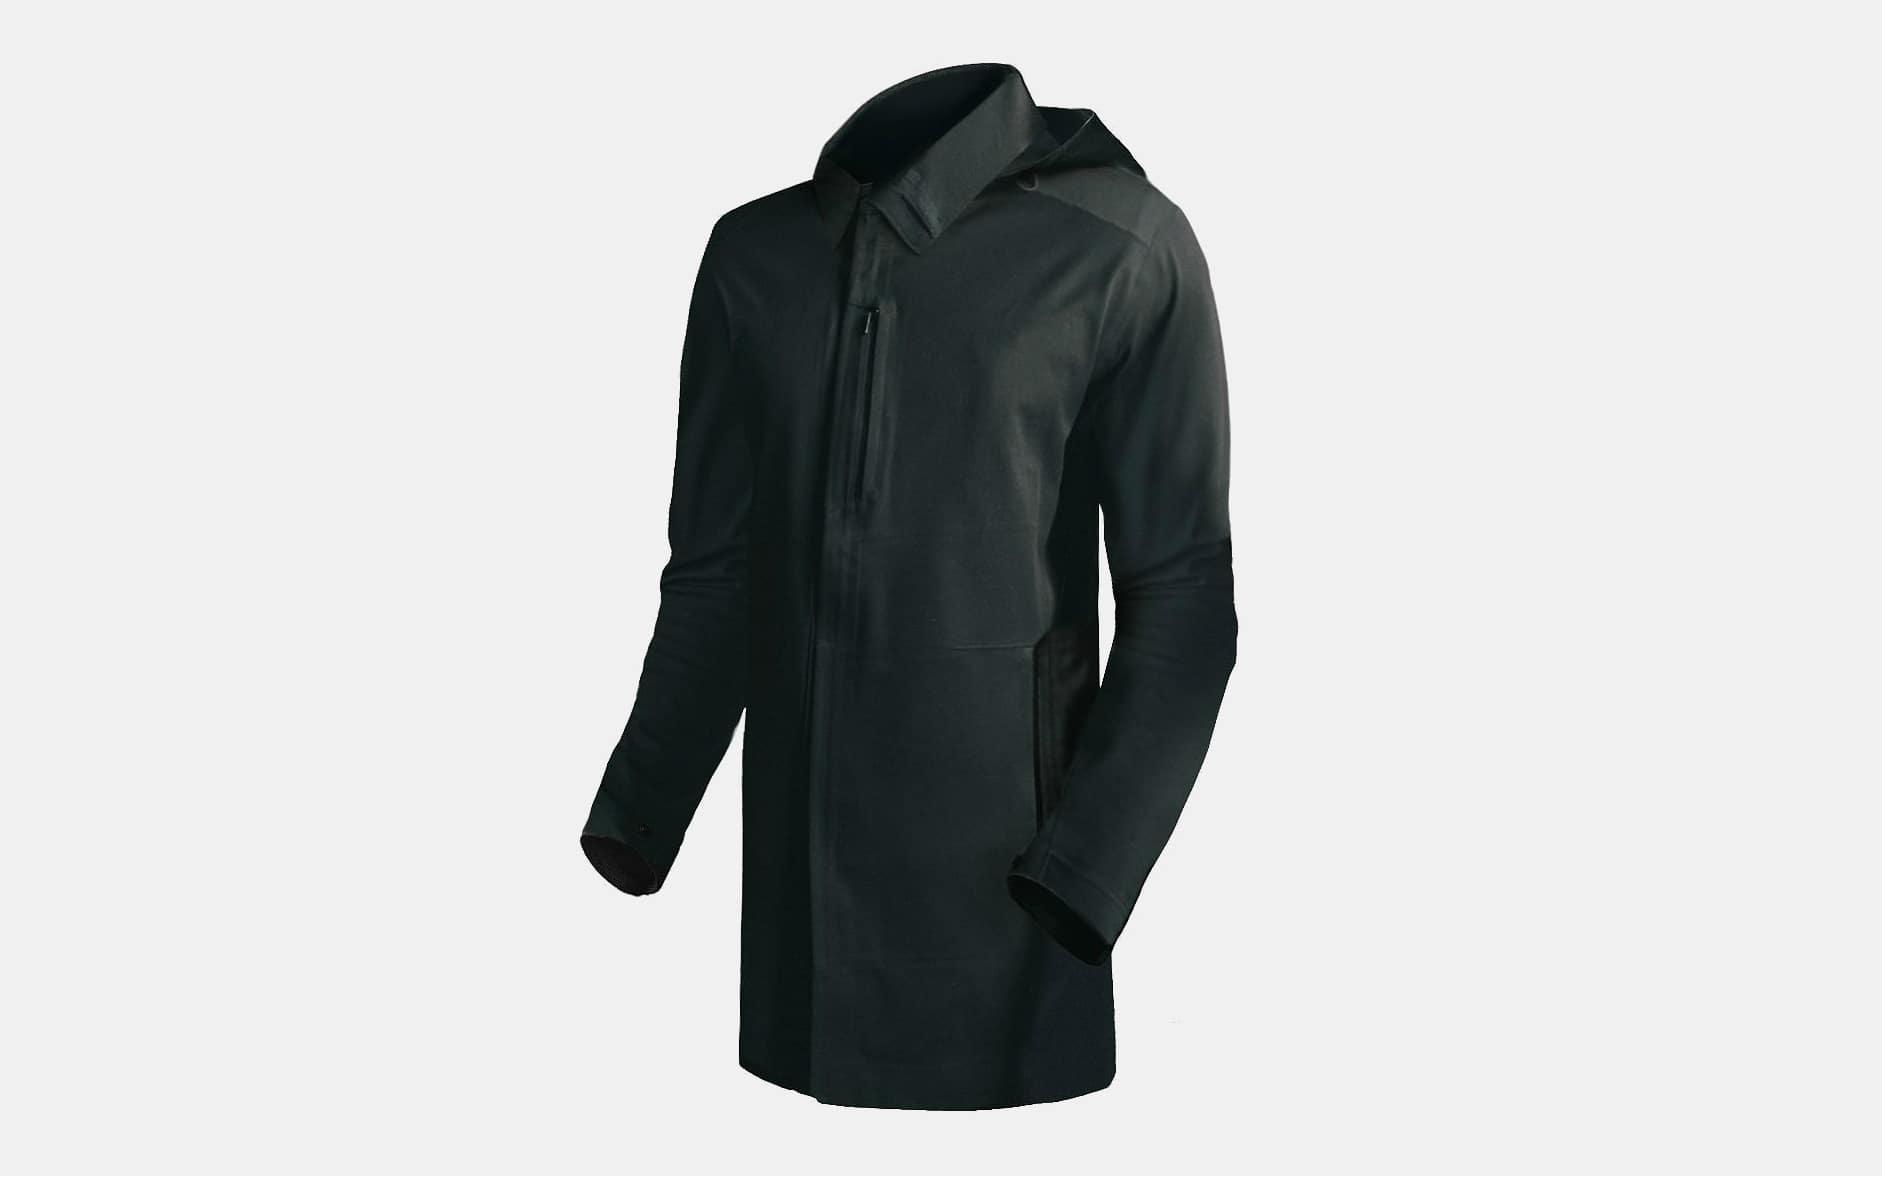 Mission Workshop Bremen Mackintosh Raincoat